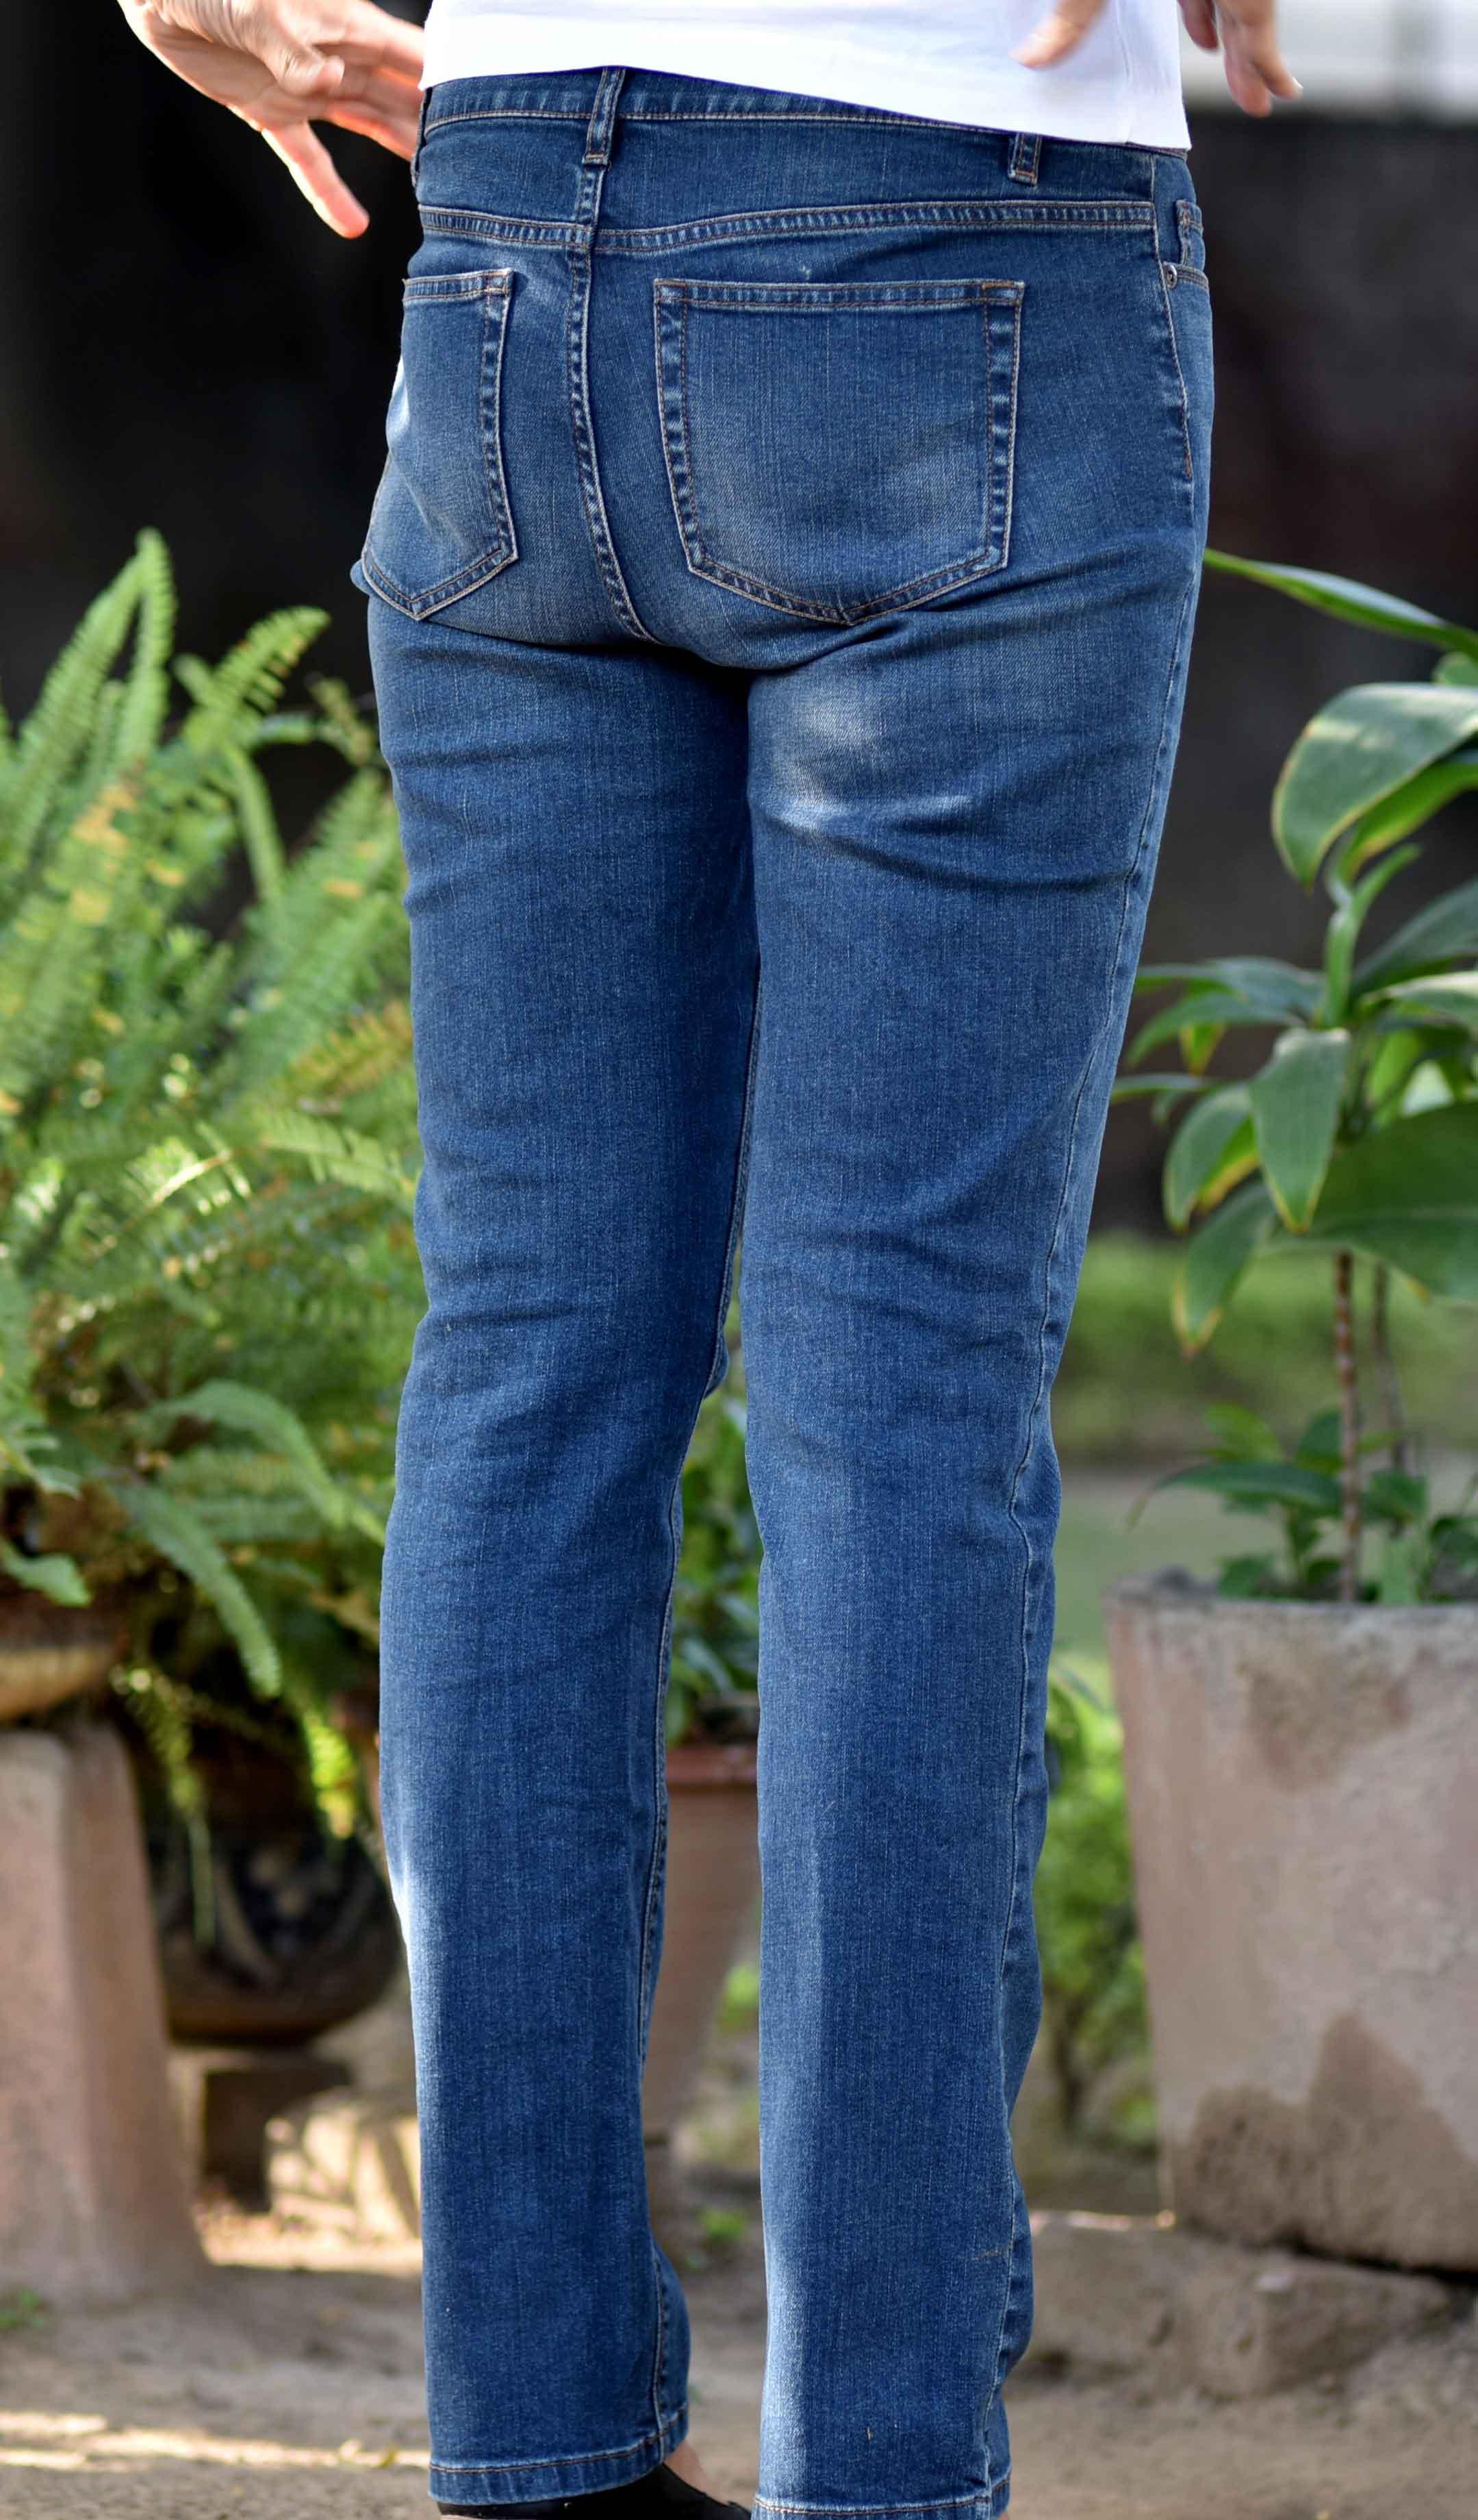 The JJill Authentic Fit Slim Leg Jeans with 1% spandex. Image©gunjanvirk